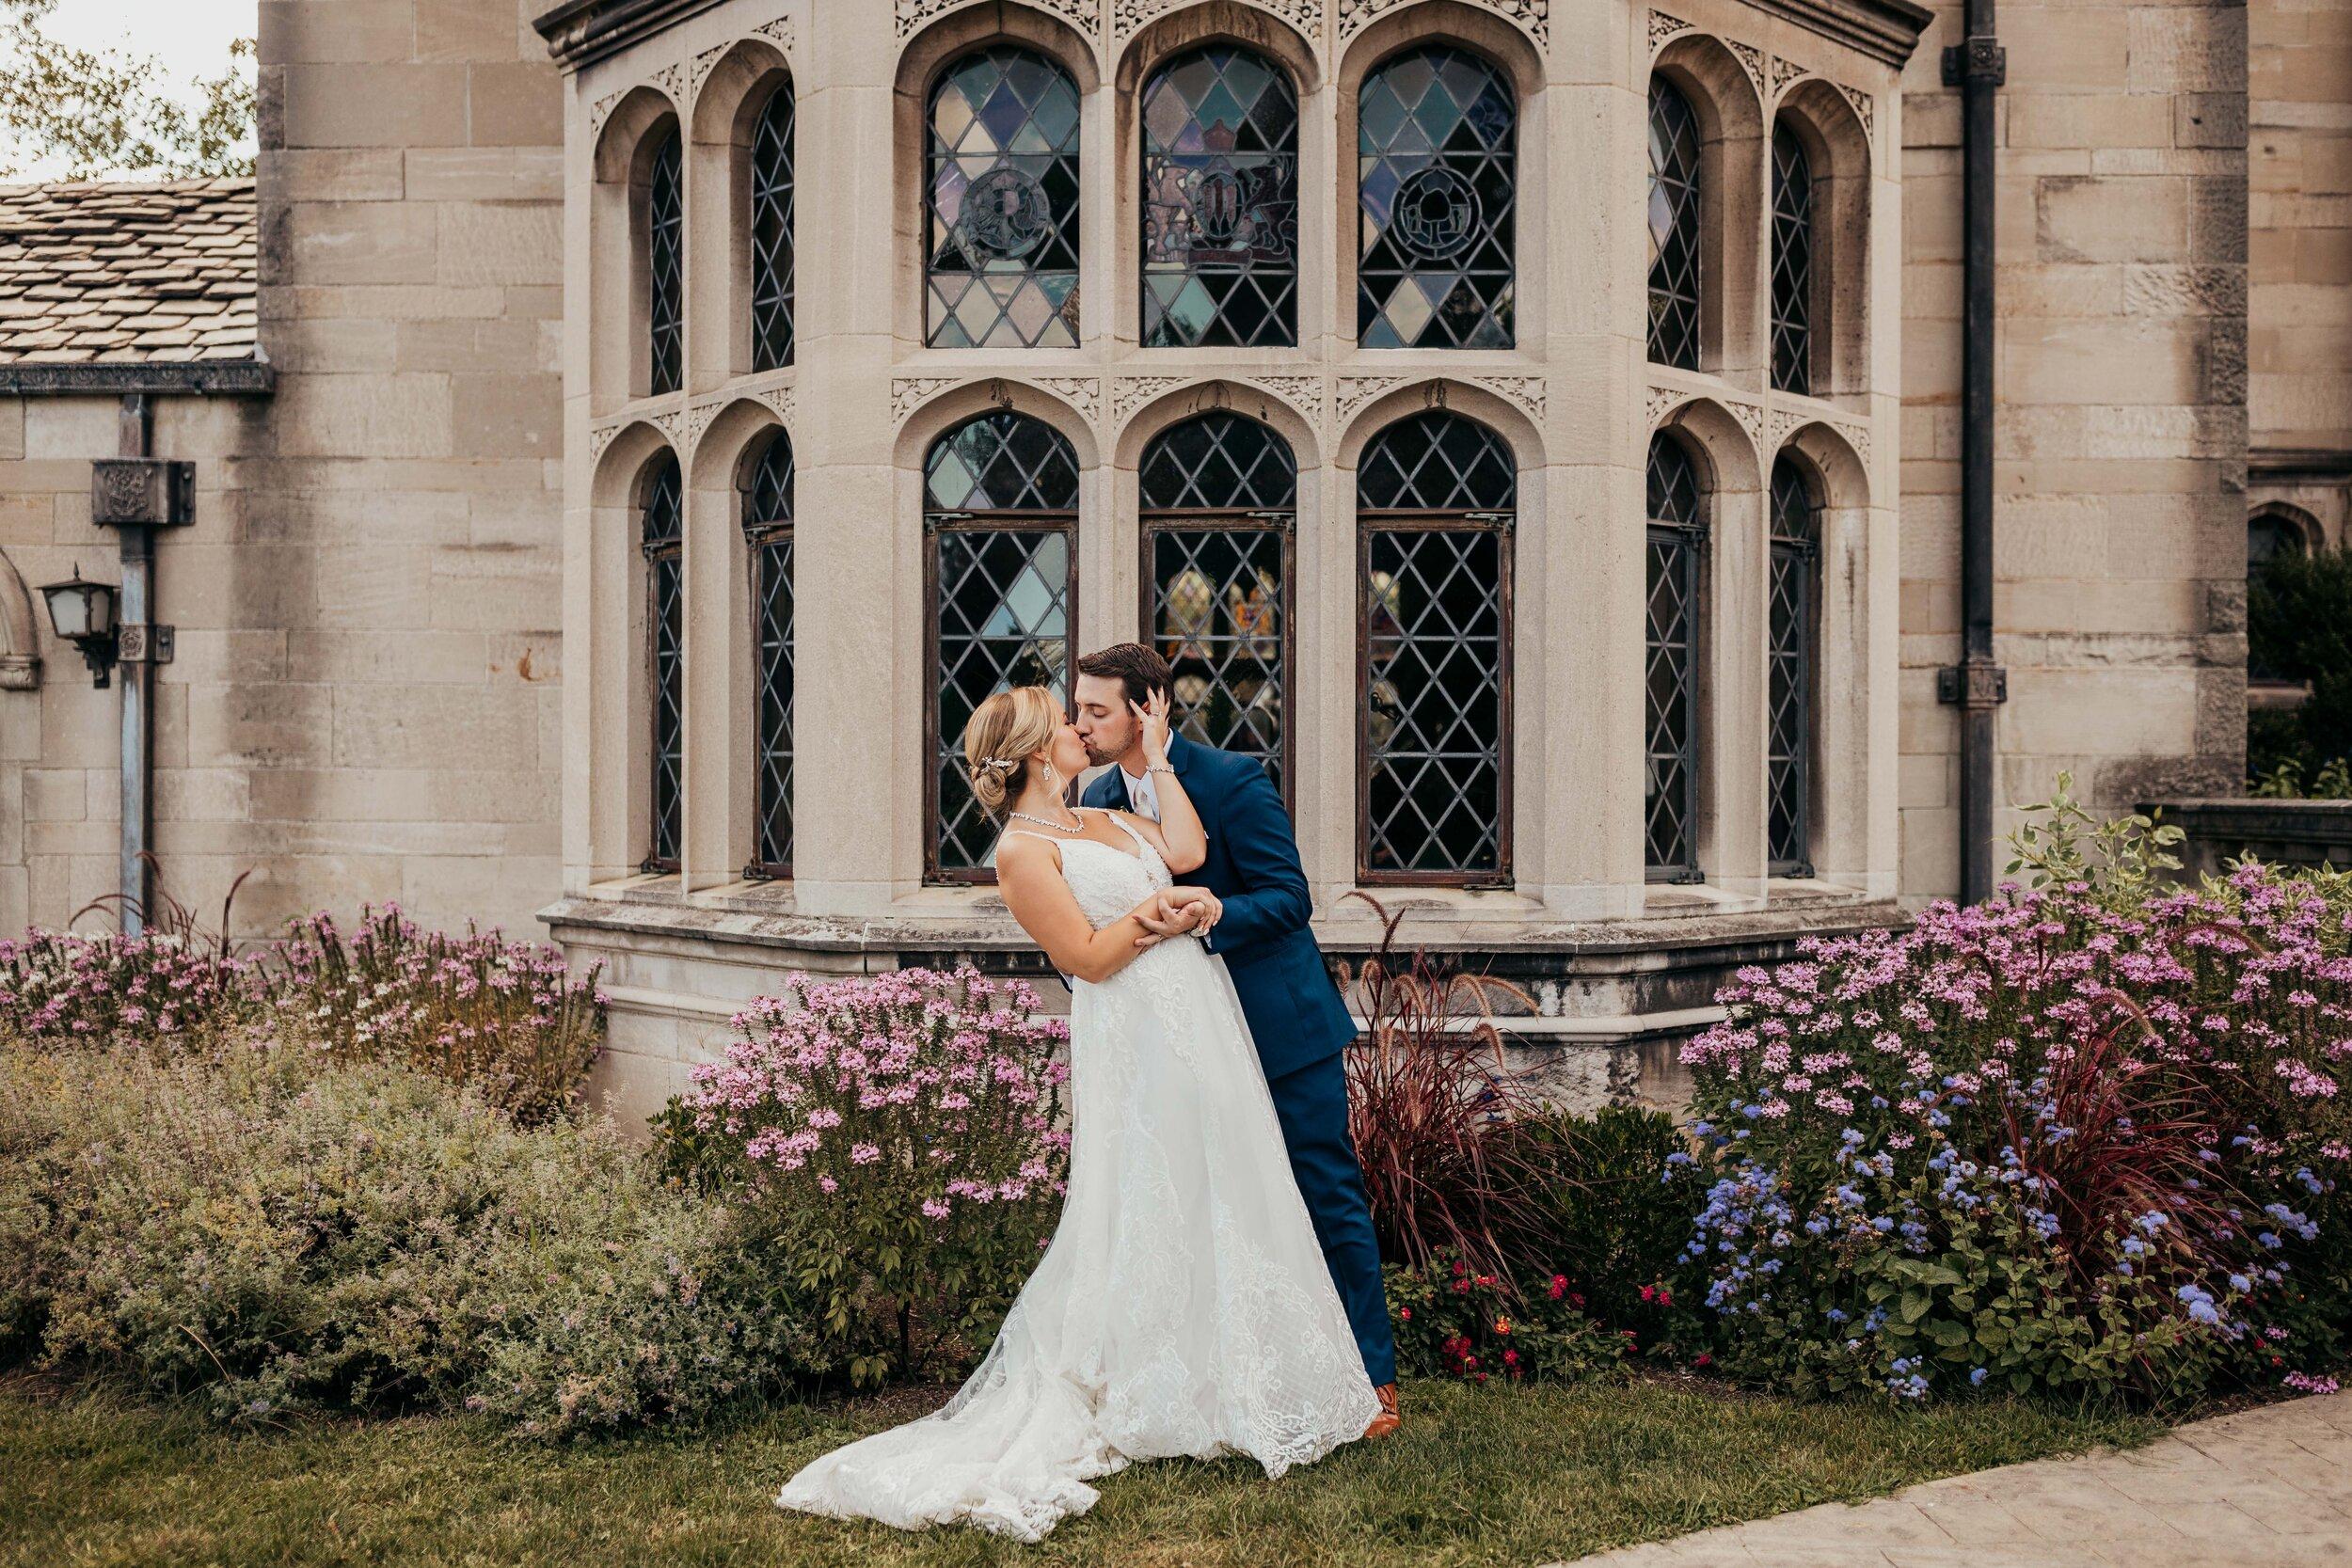 Pittsburgh wedding photography - Hartwood Acres Mansion wedding-931.jpg